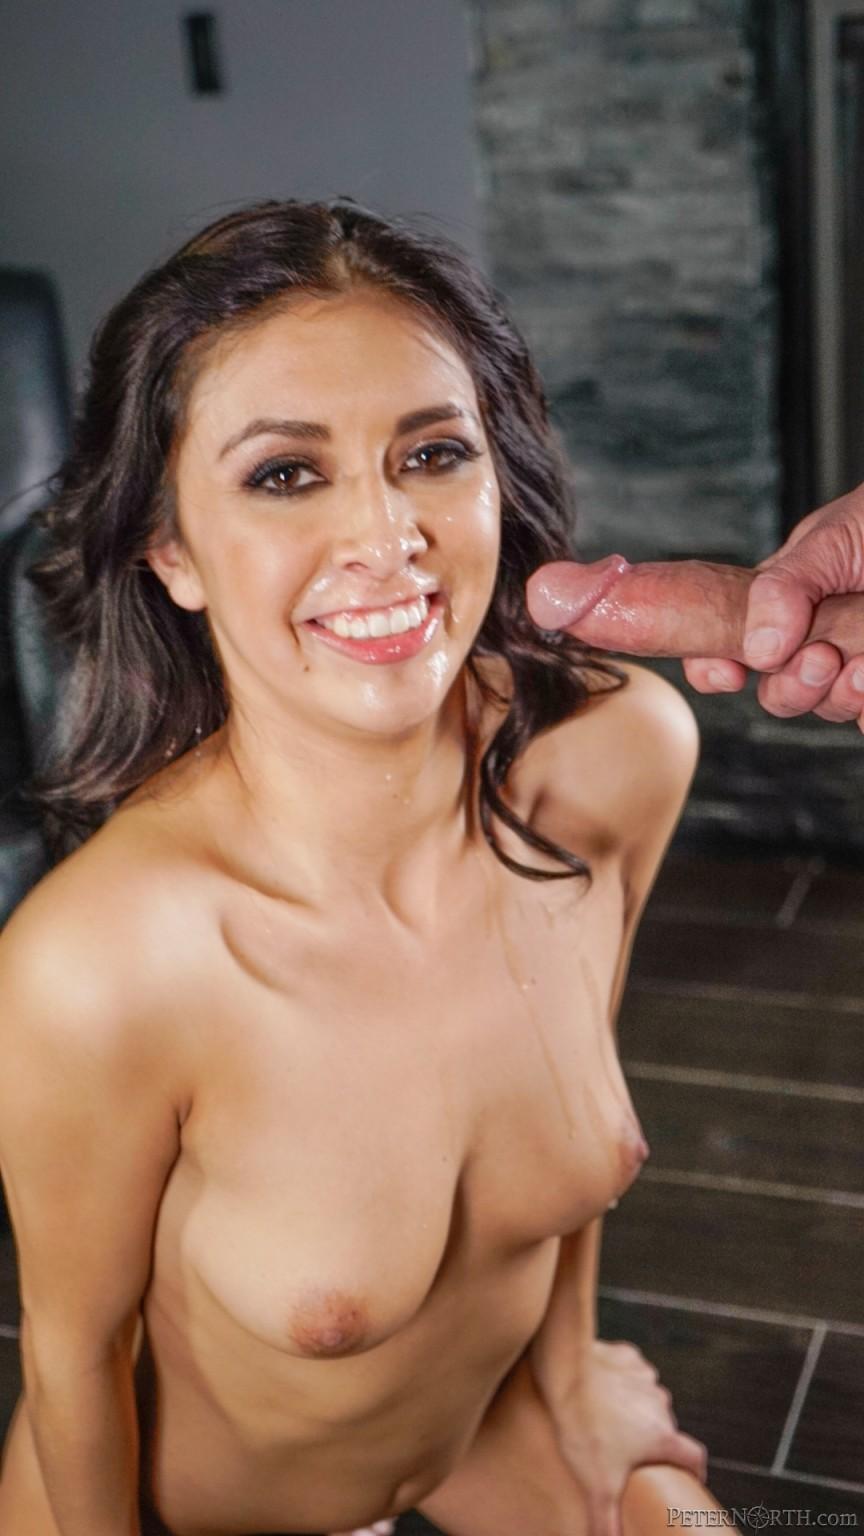 Kara Faux - От первого лица - Галерея № 3628726